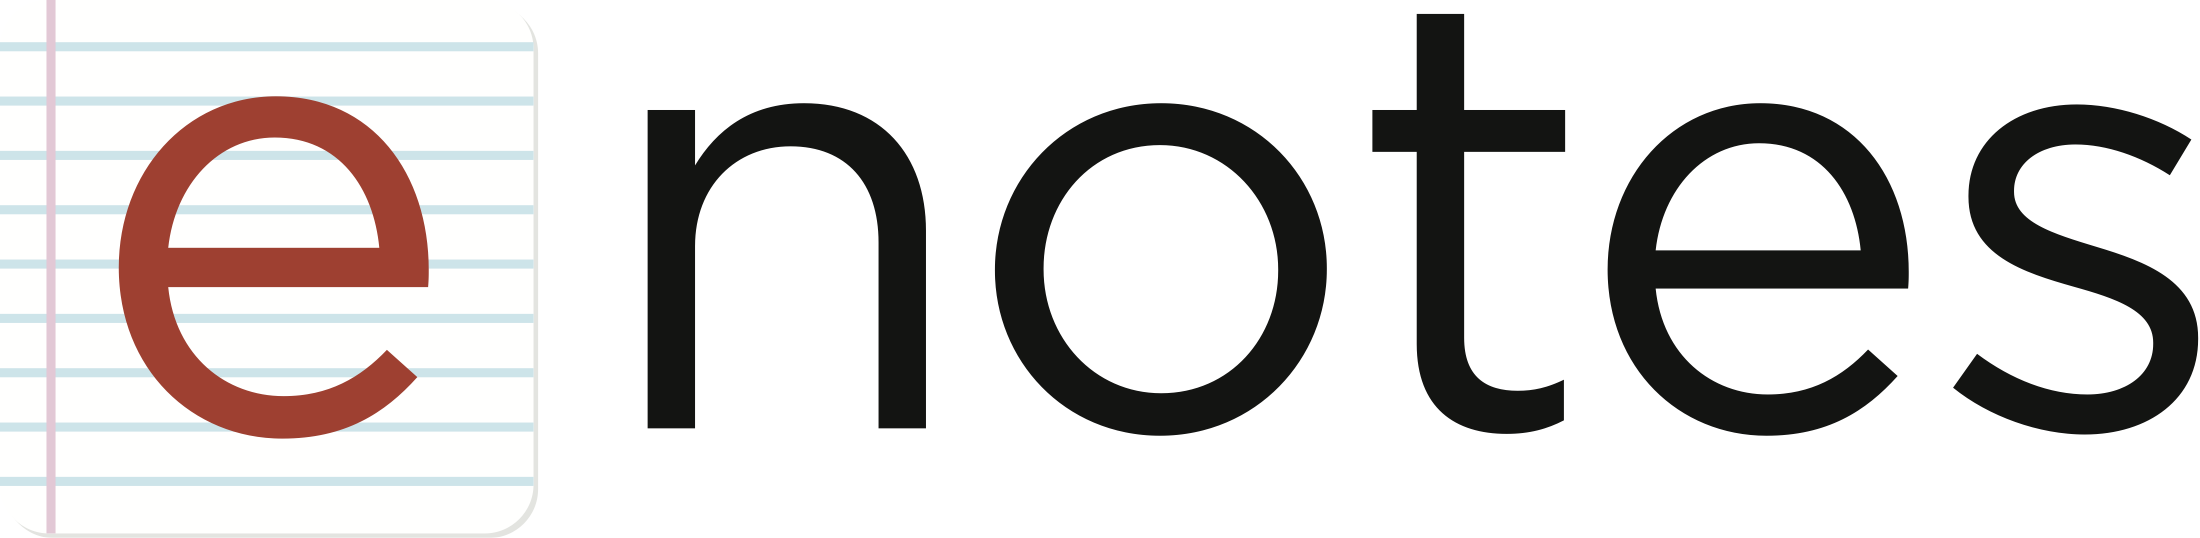 enotes_logo_black